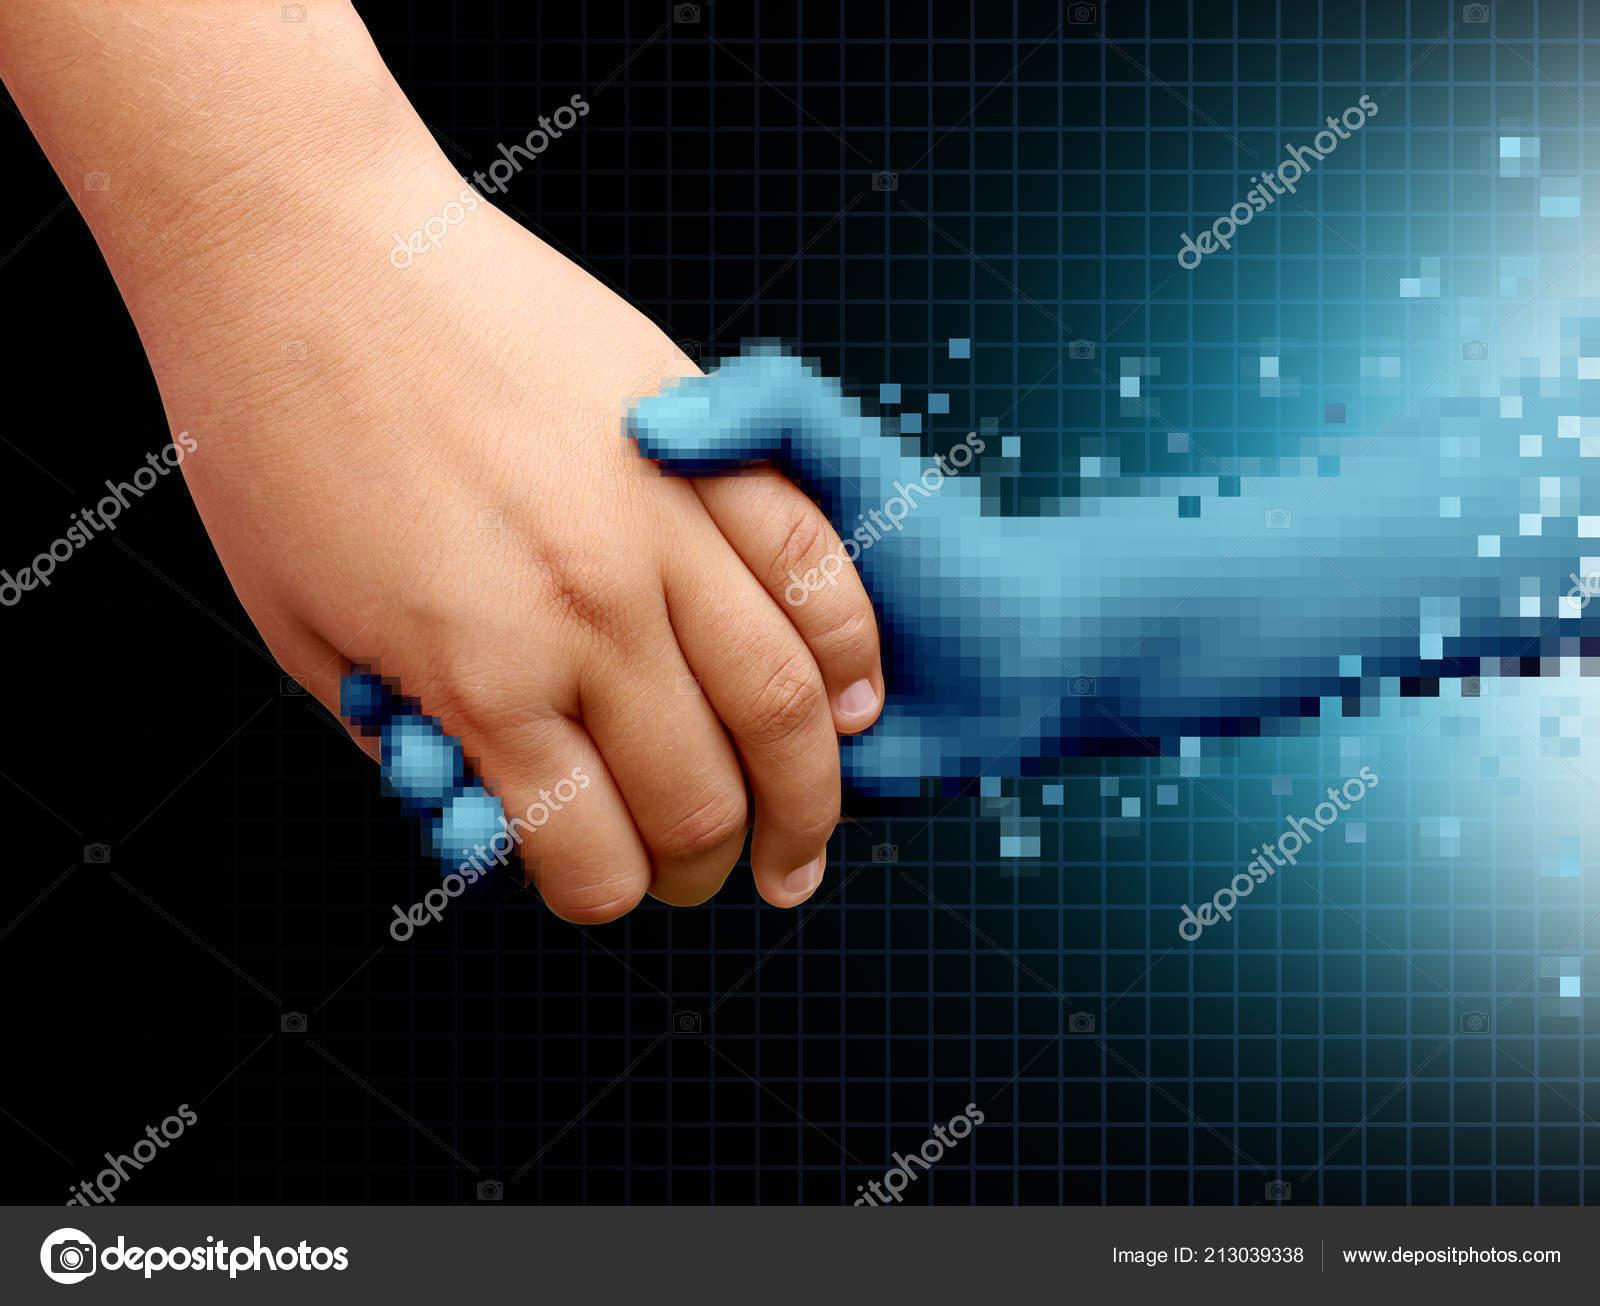 Online Friend Virtual Interactive Friendship Concept Social Media